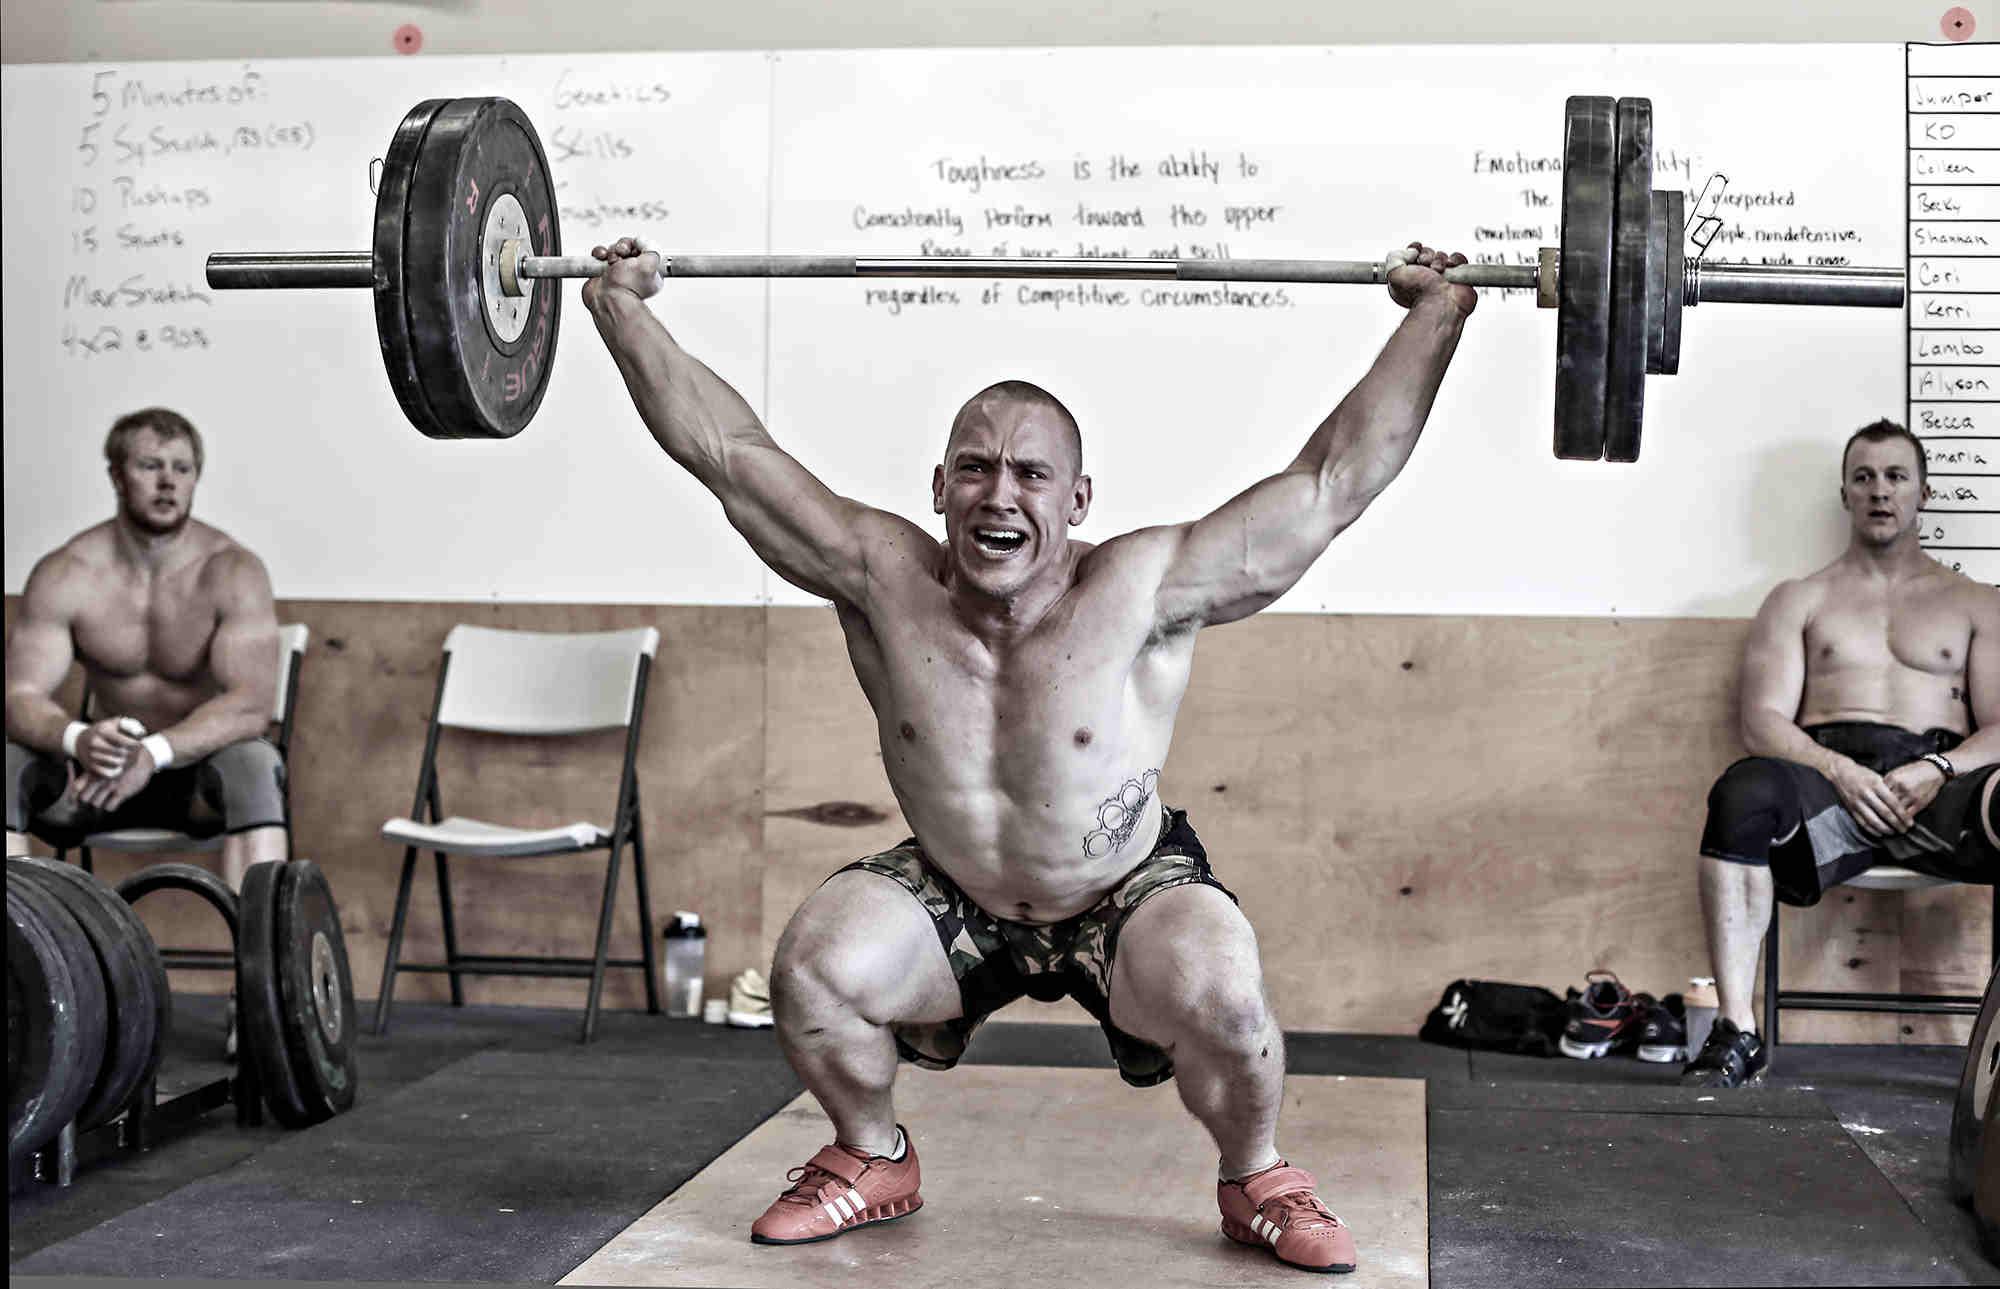 Astuce : améliorez votre Overhead Squat grâce un exercice simple